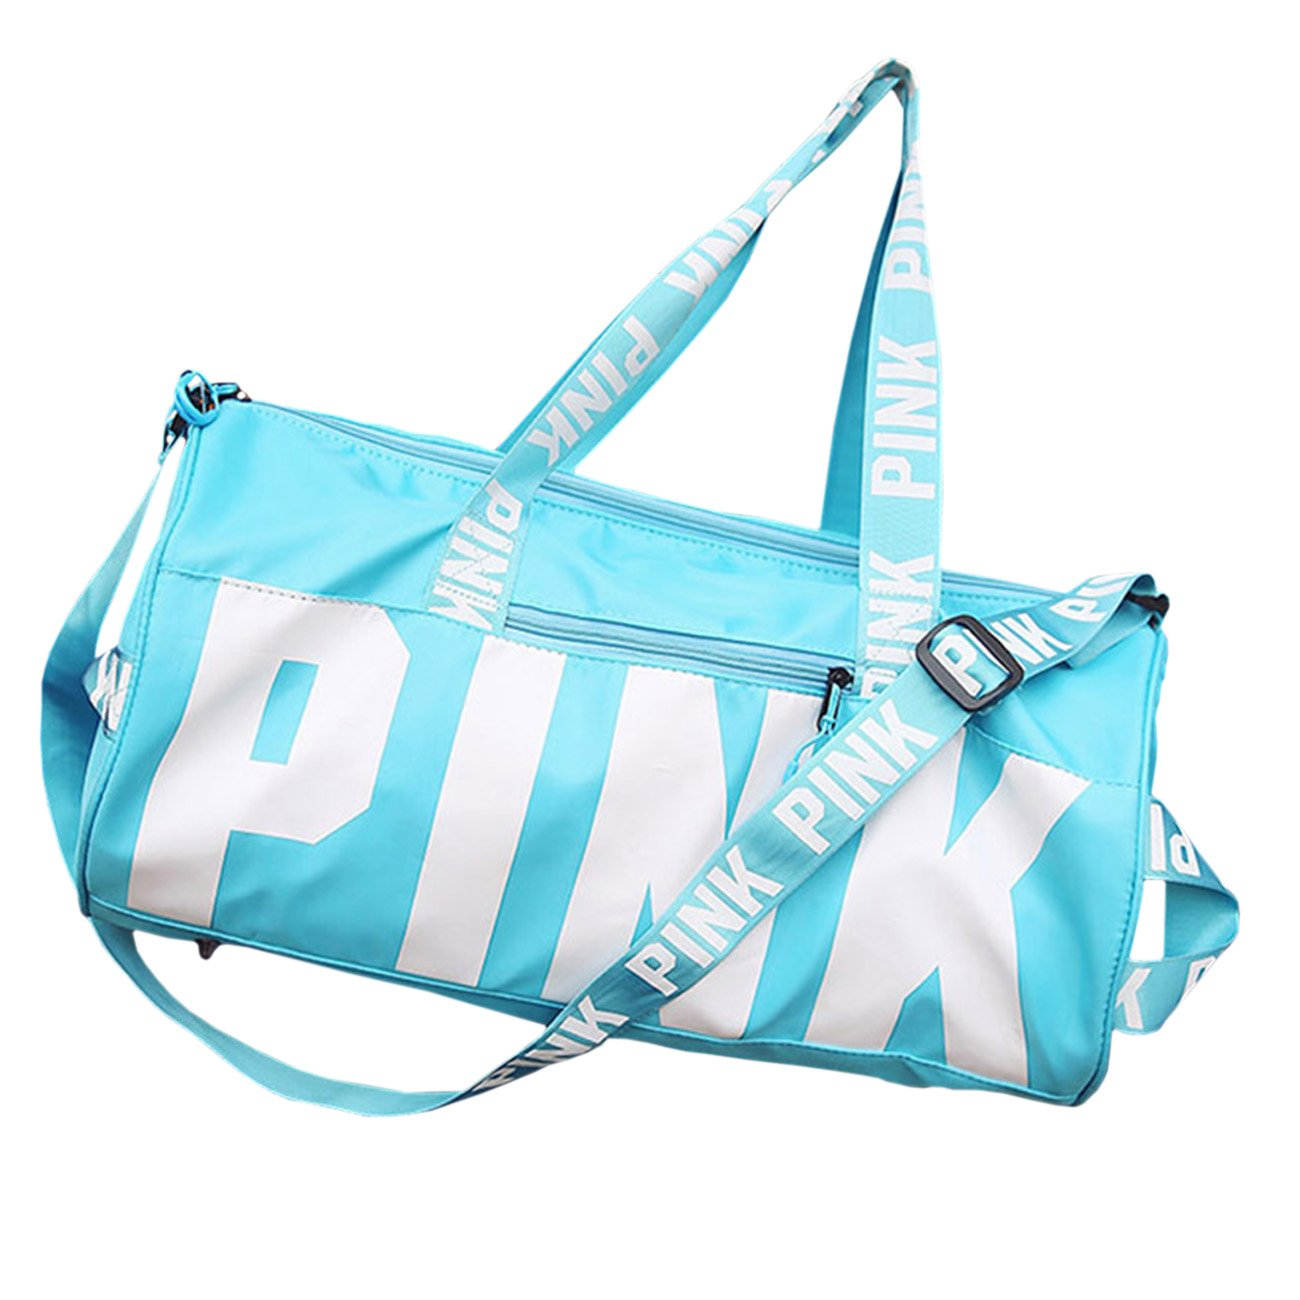 THEE Women High Capacity Waterproof Sports Bag Travel Tote Bag